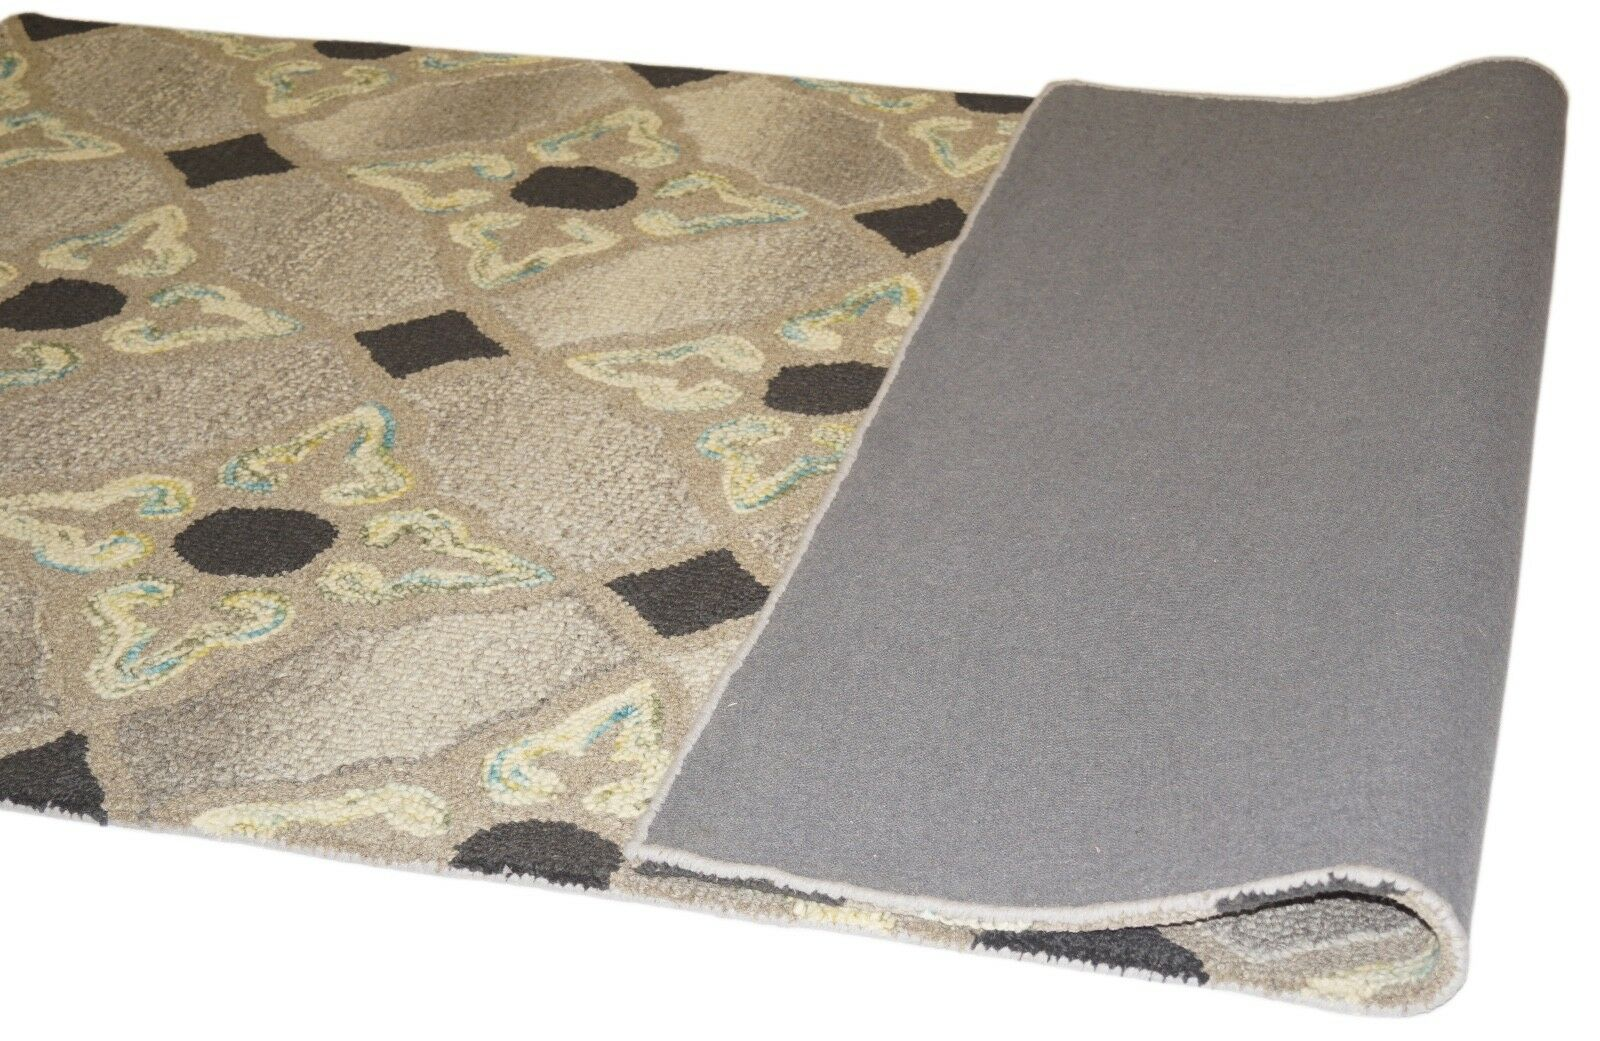 Designer Tapis 150x240 cm à la main Loop ~ 100% Laine-handgetuftet Loop main b34a5f